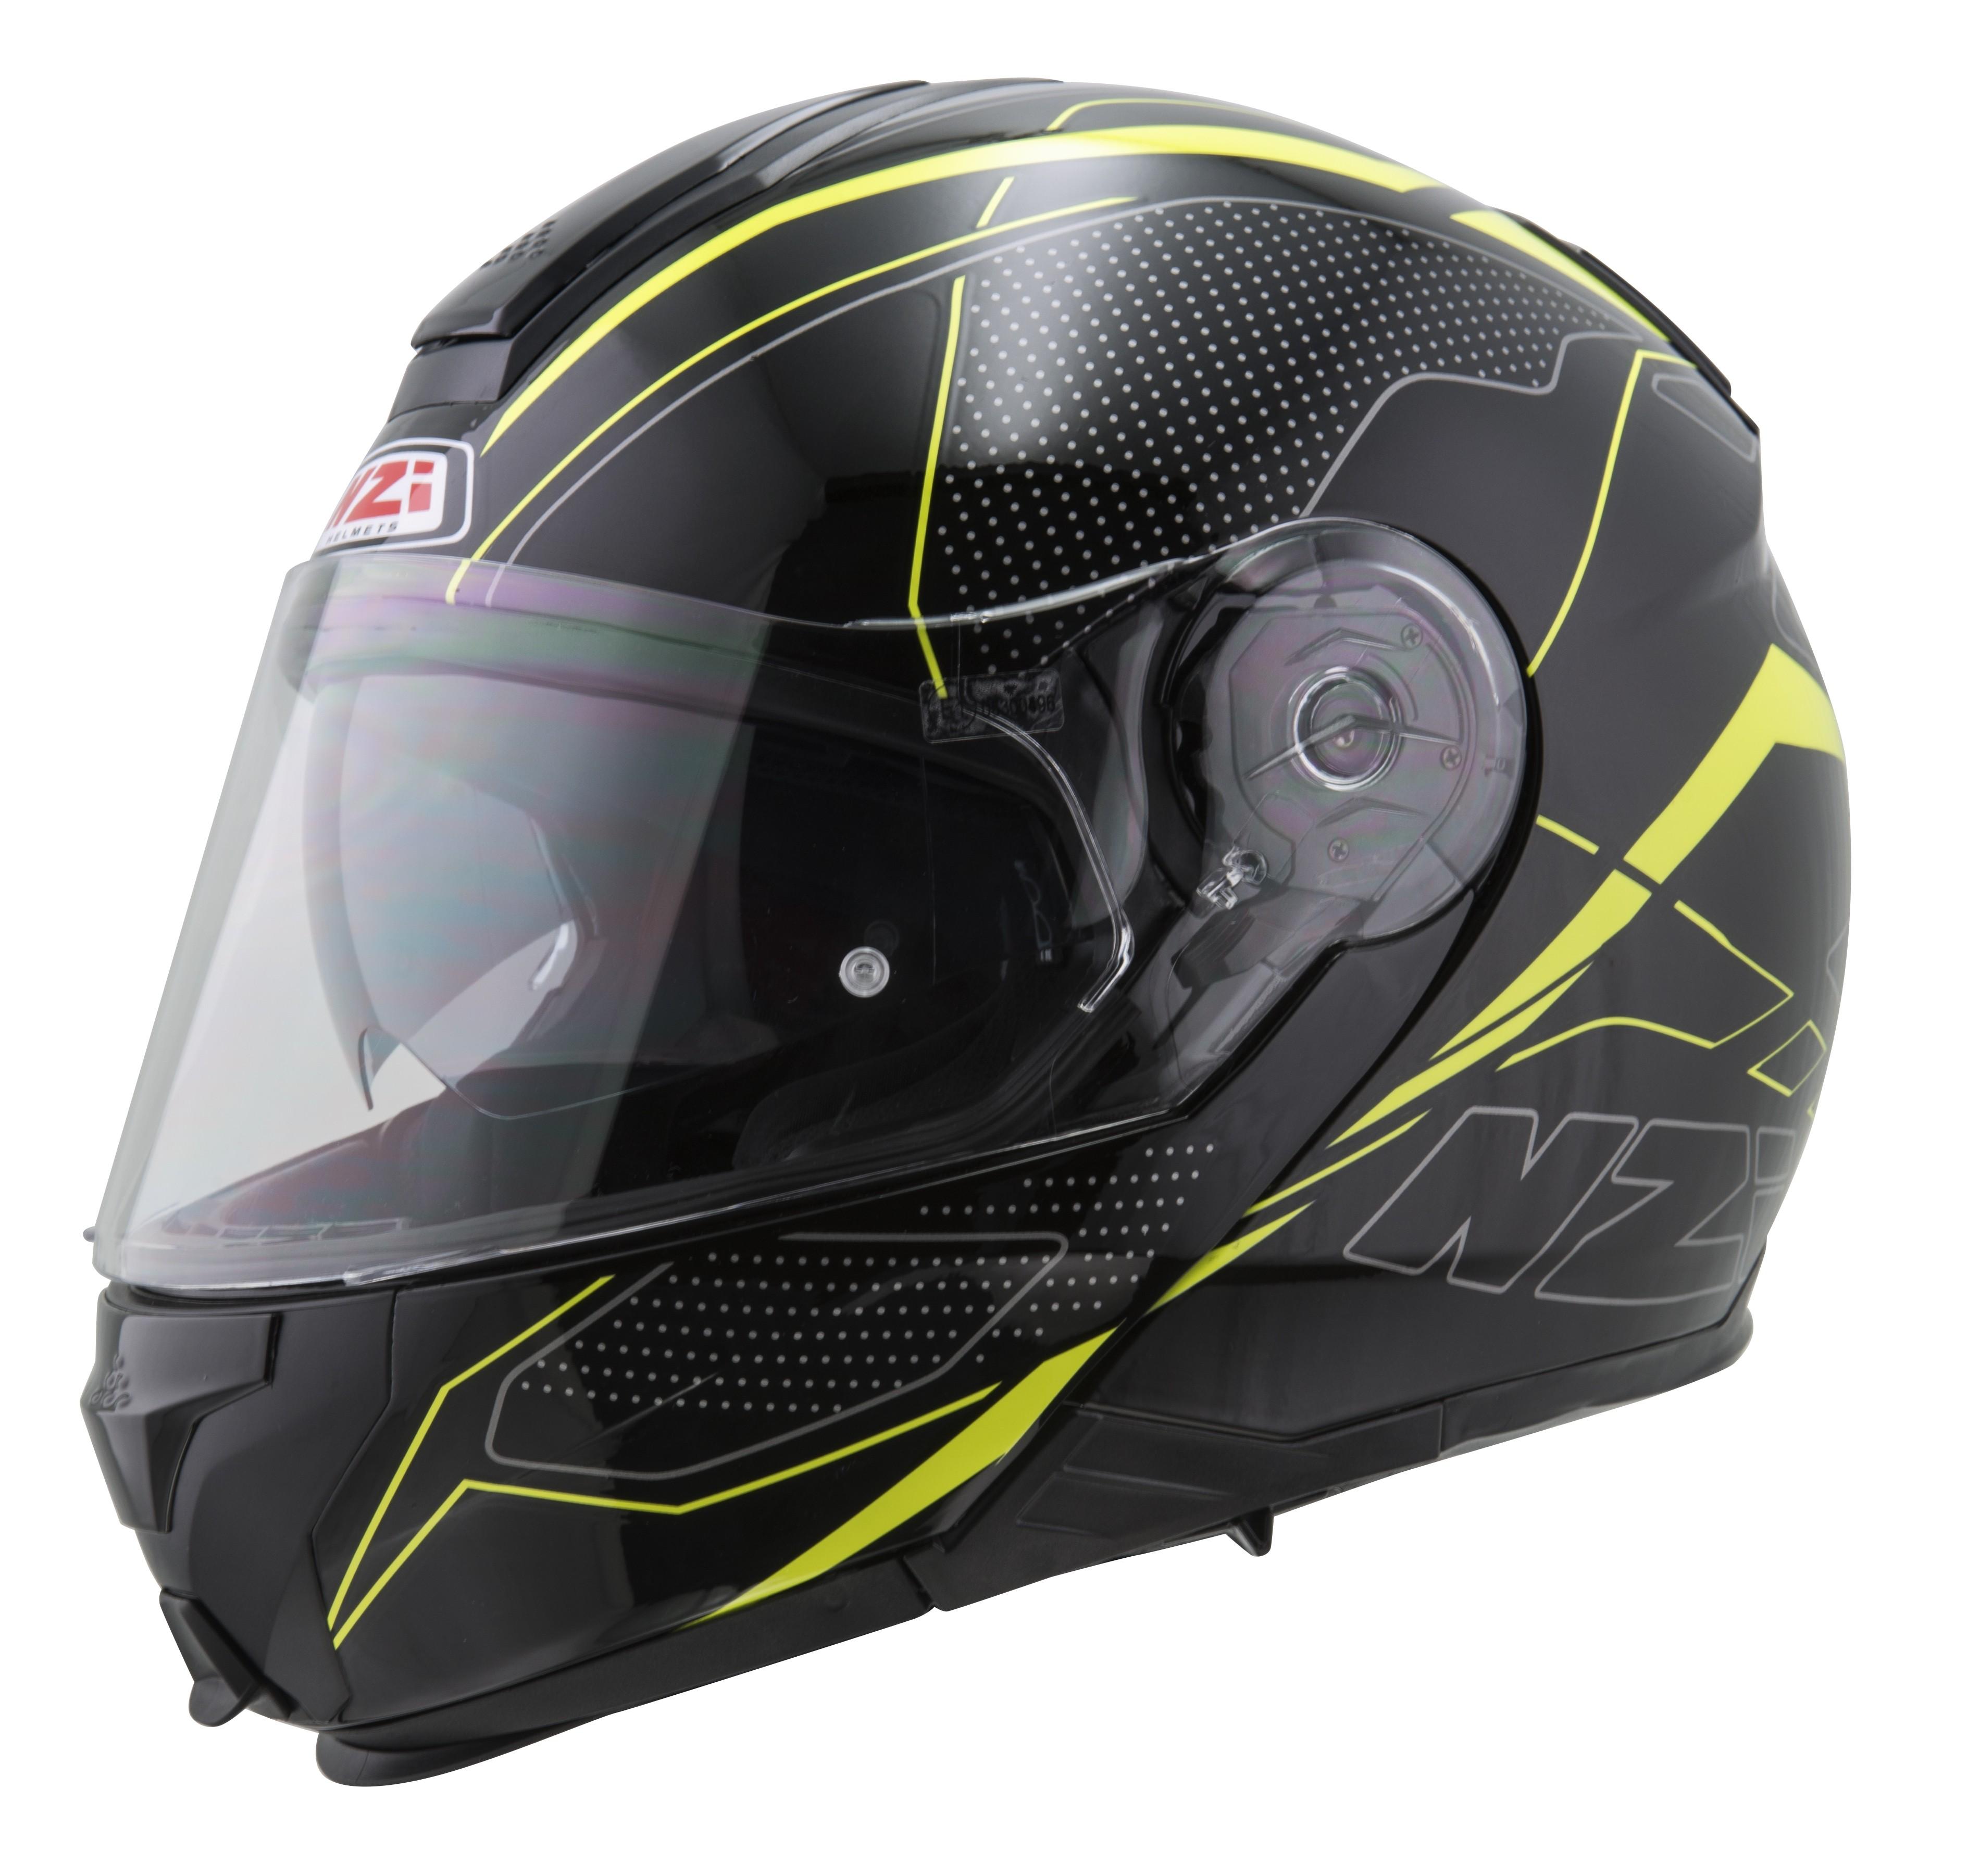 casco-nzi-combi2-duo-graphics-sword-negro-amarillo-brillante